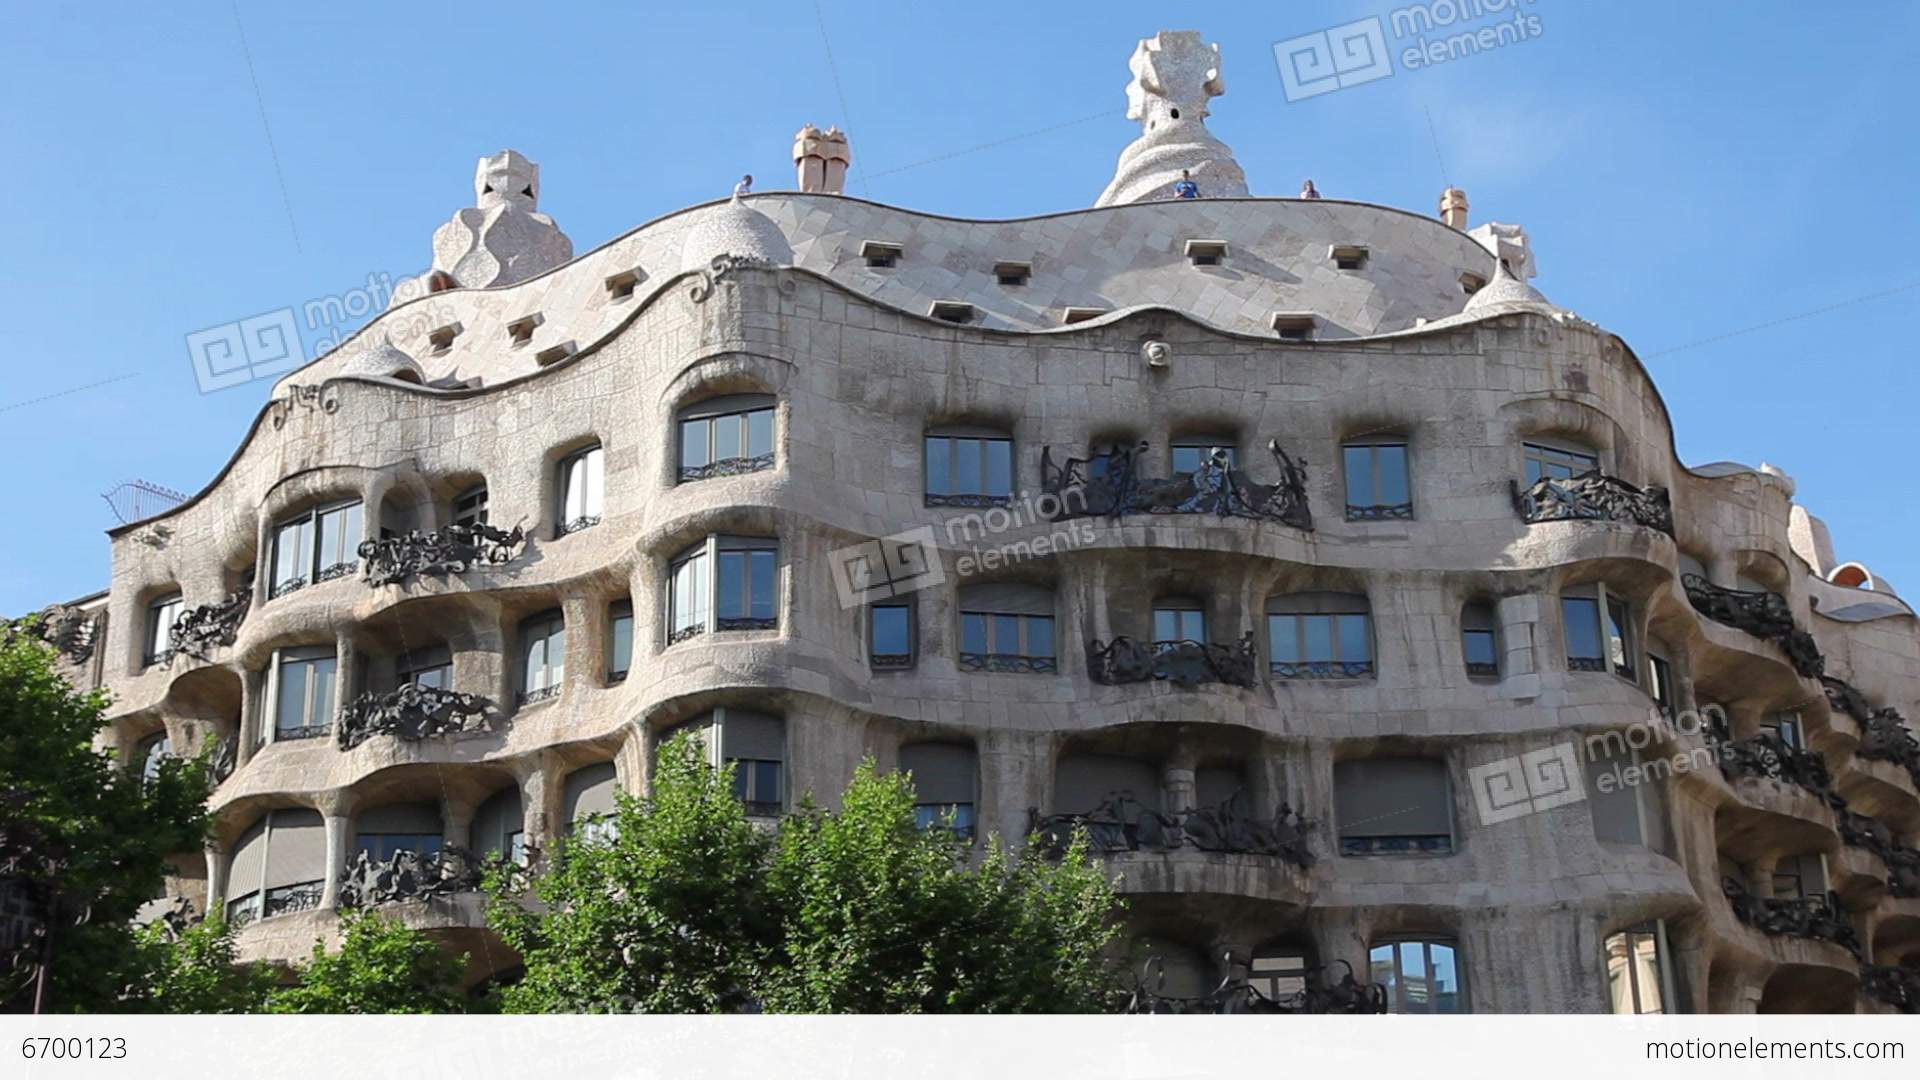 La pedrera casa mila gaudi building in barcelona stock video footage 6700123 - Casa la pedrera gaudi ...